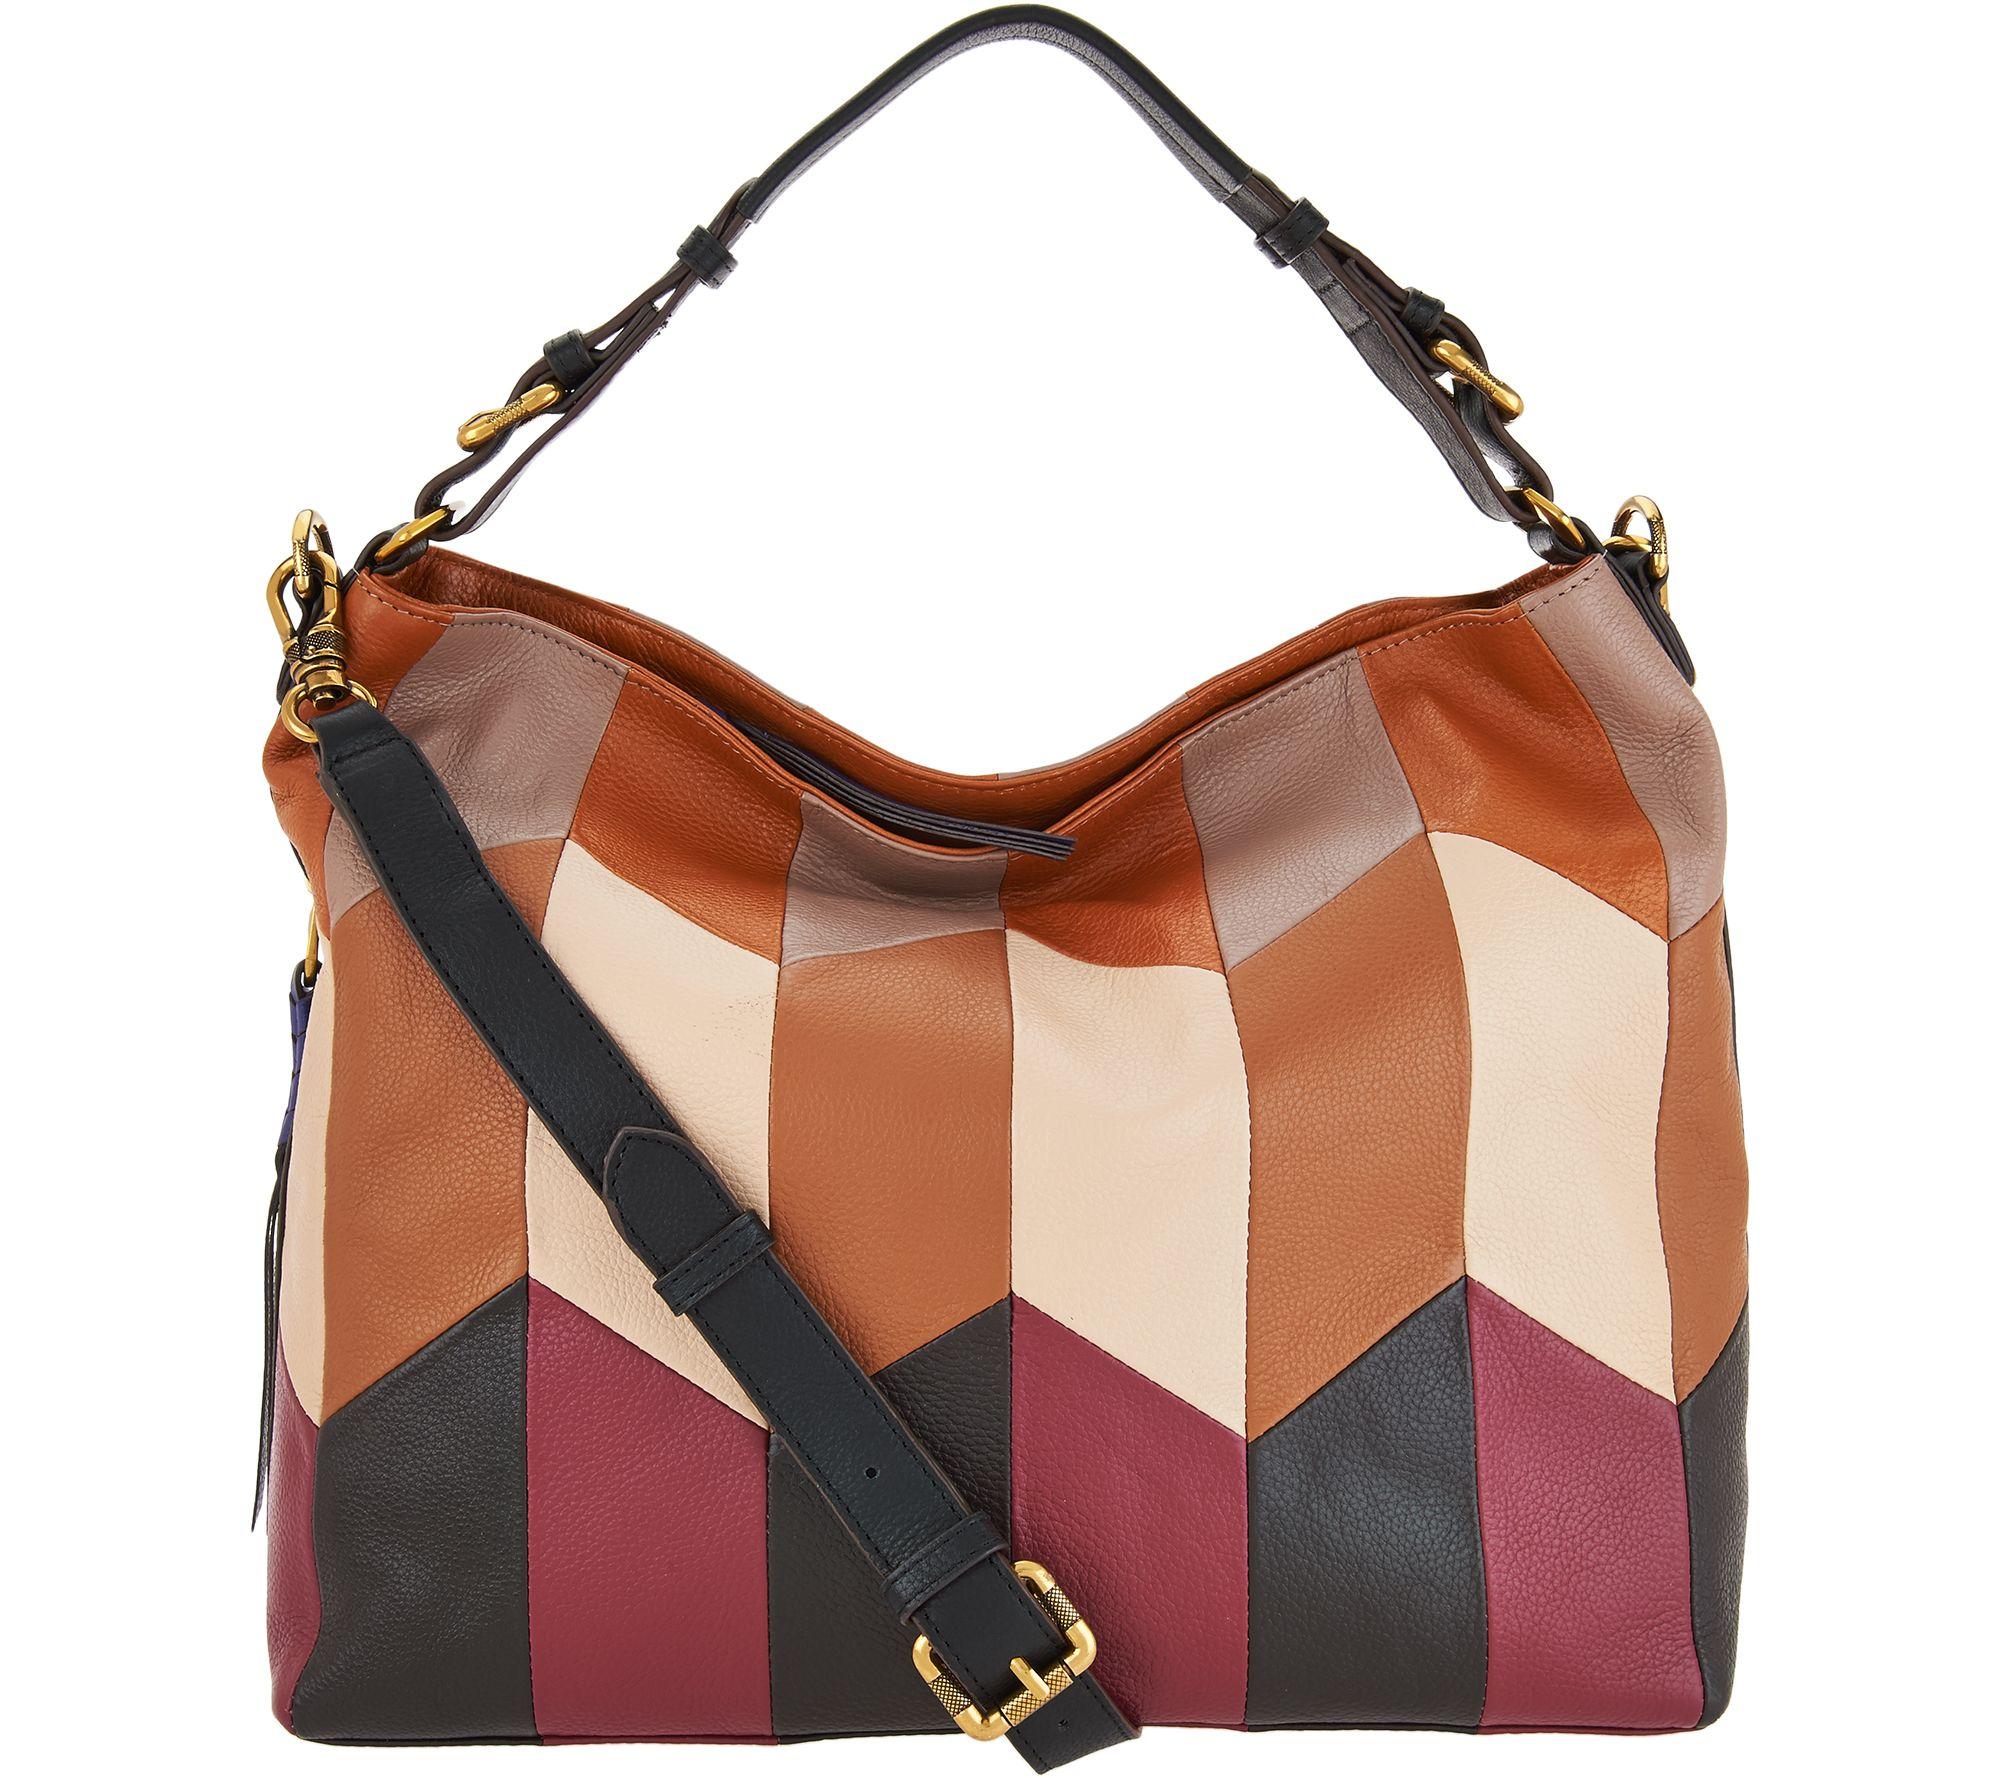 6dd443a7b54d orYANY Pebble Leather Convertible Hobo Handbag -Arlene - Page 1 — QVC.com